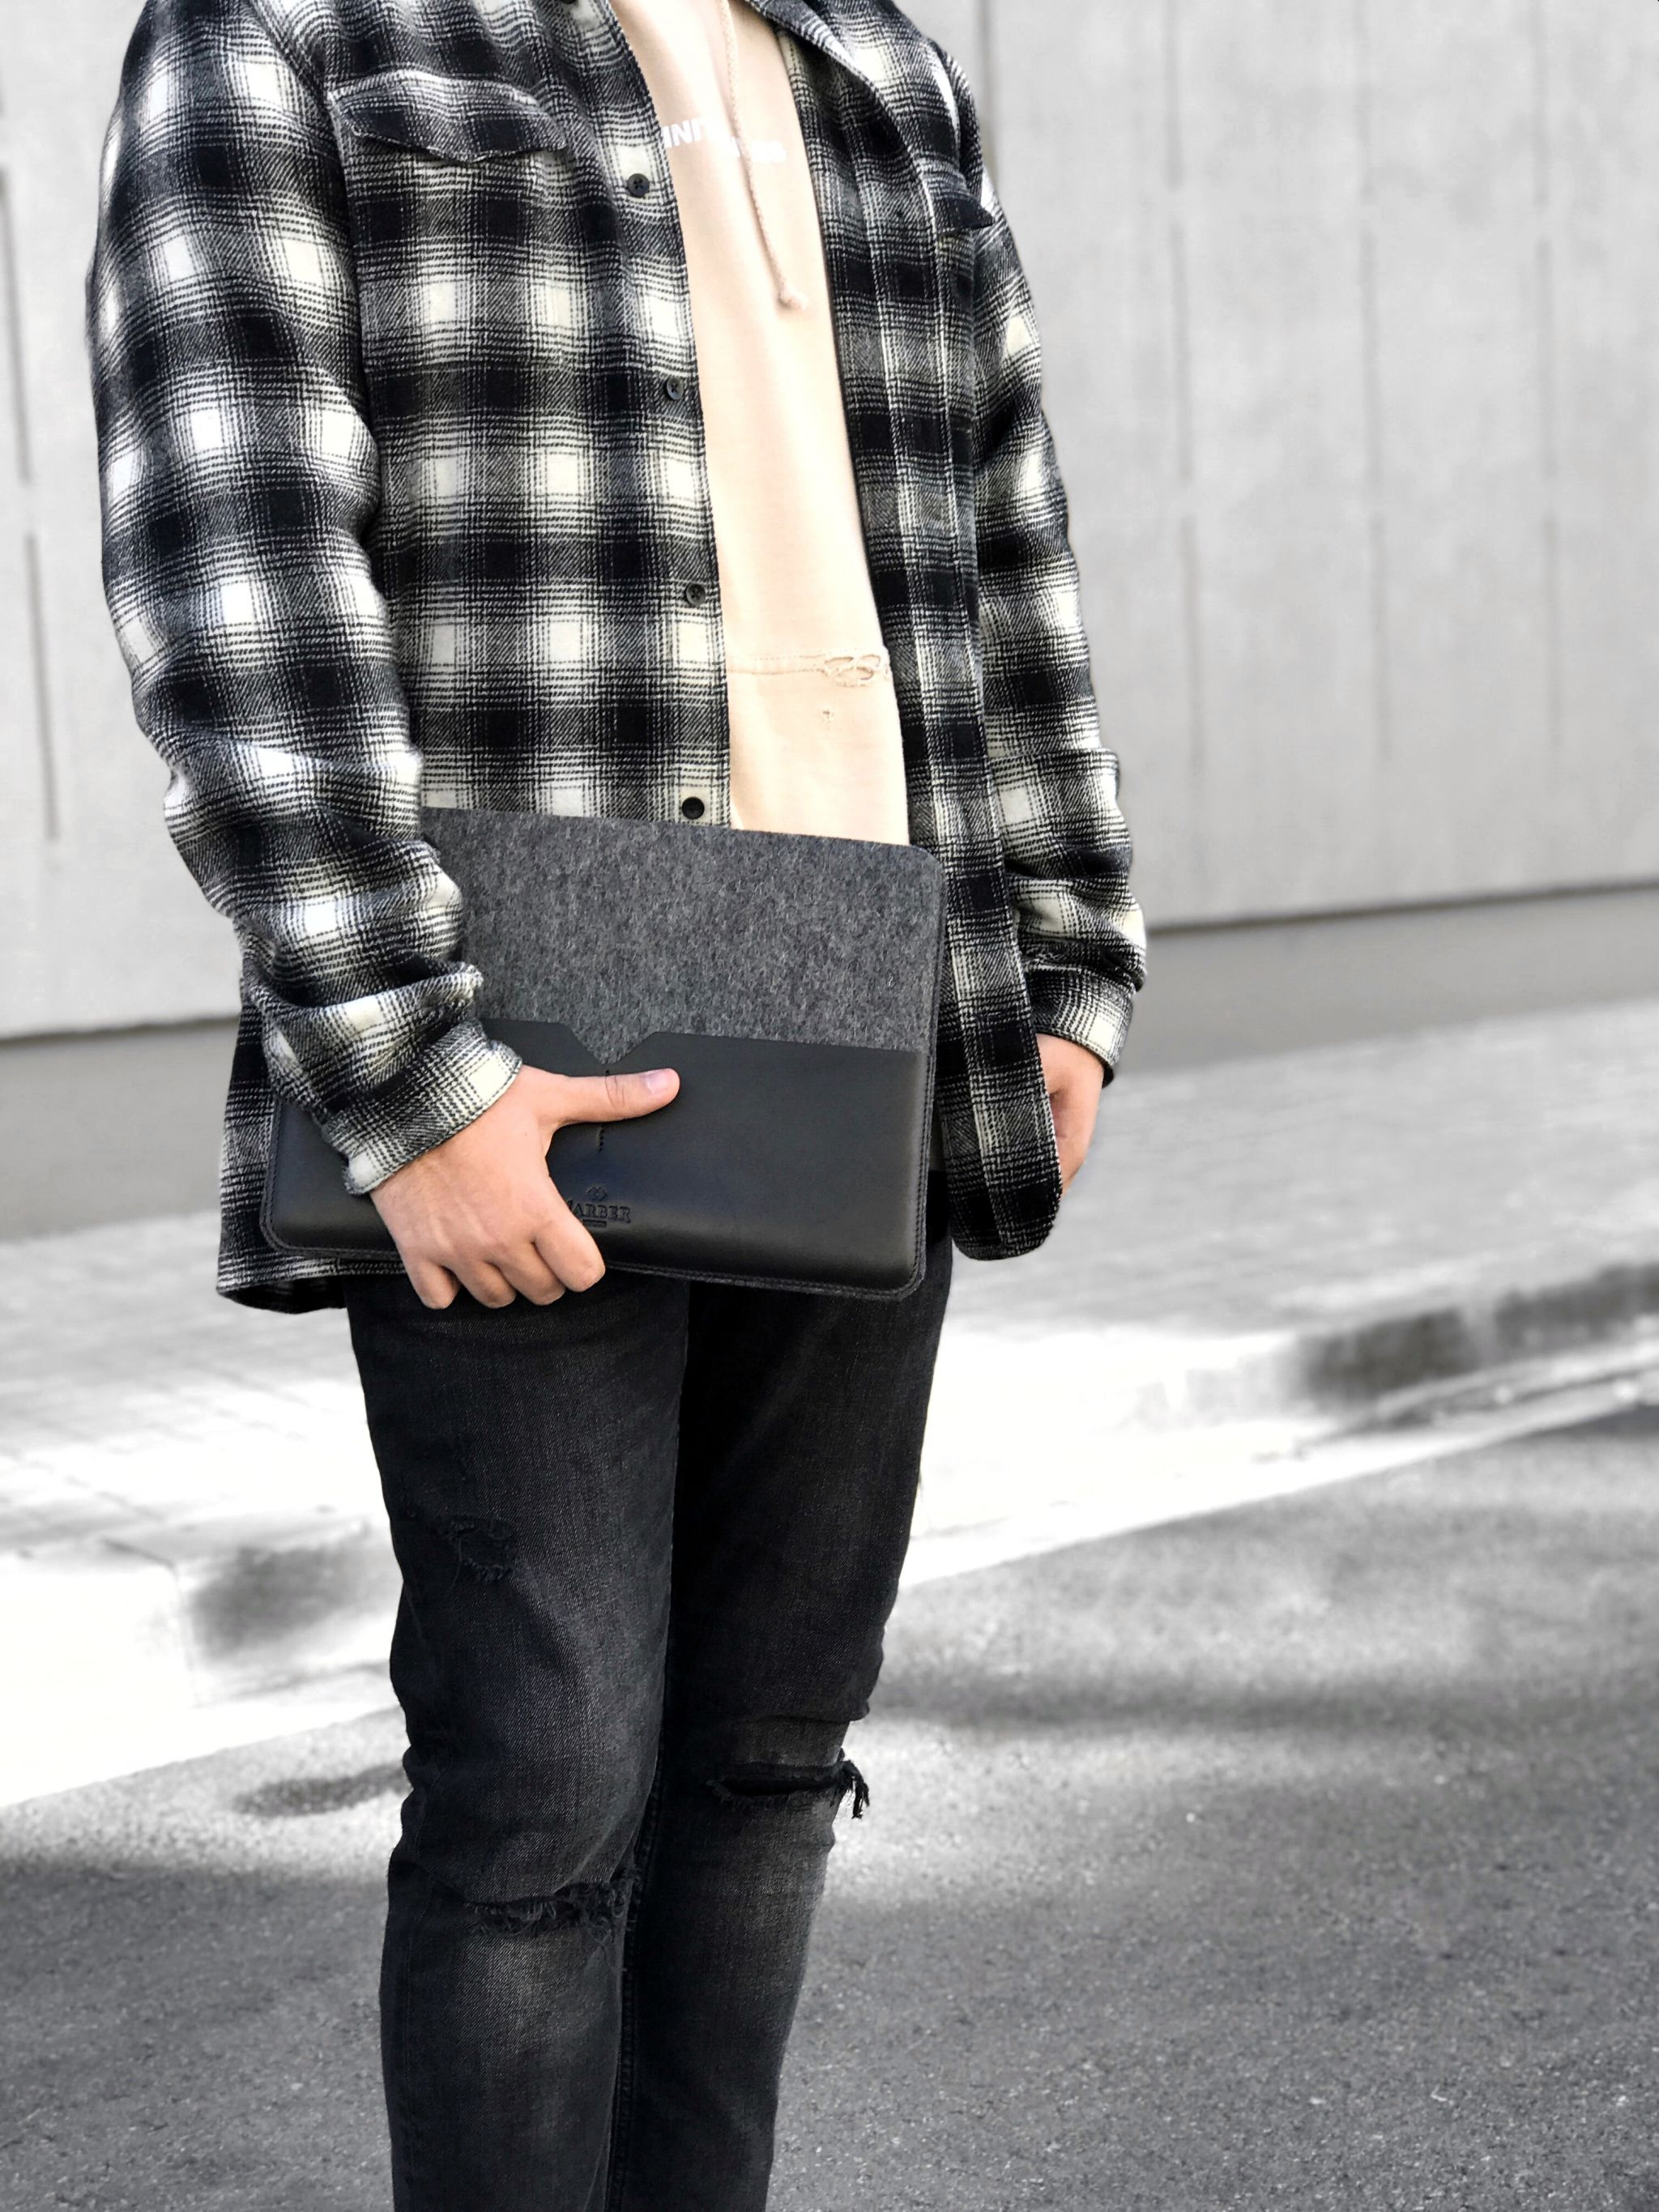 macbook sleeve harber london outfit